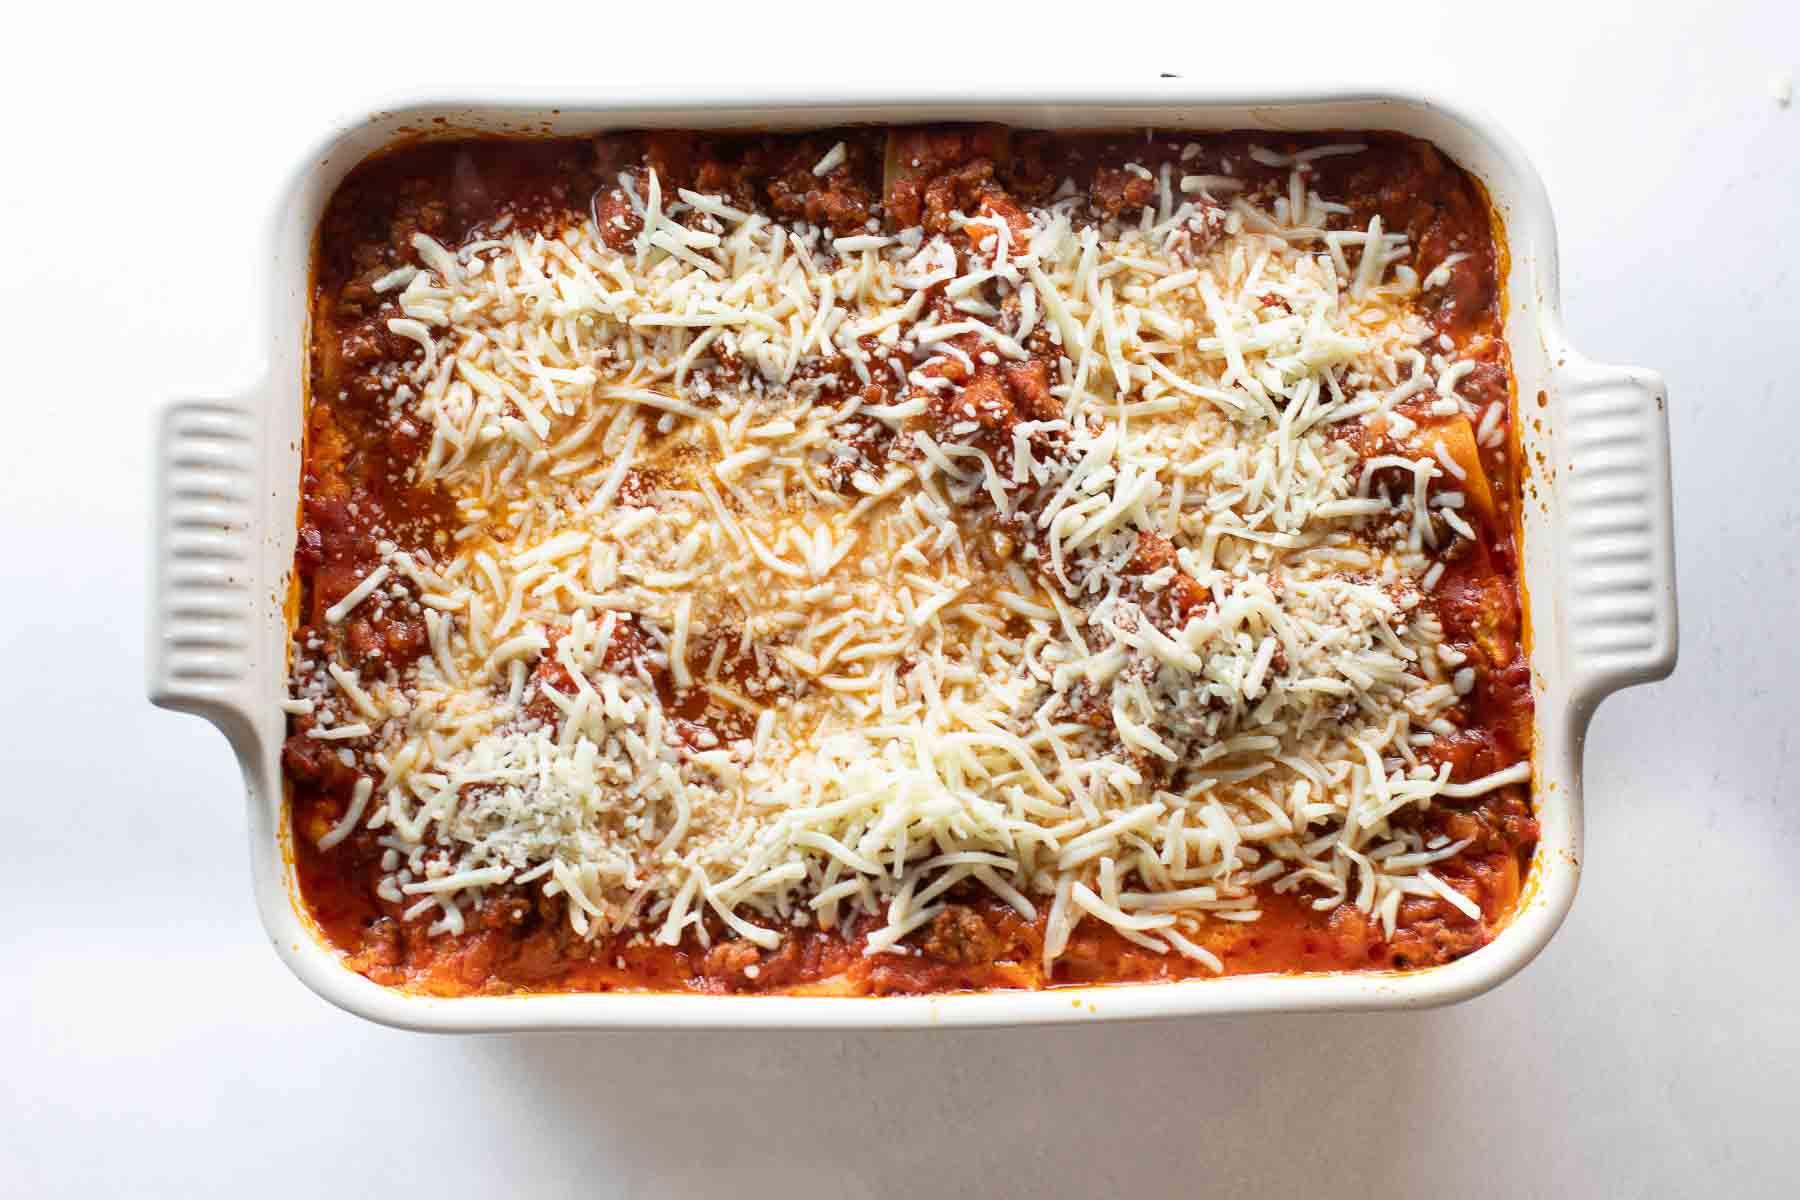 lasagna topped with mozzarella cheese in white baking dish